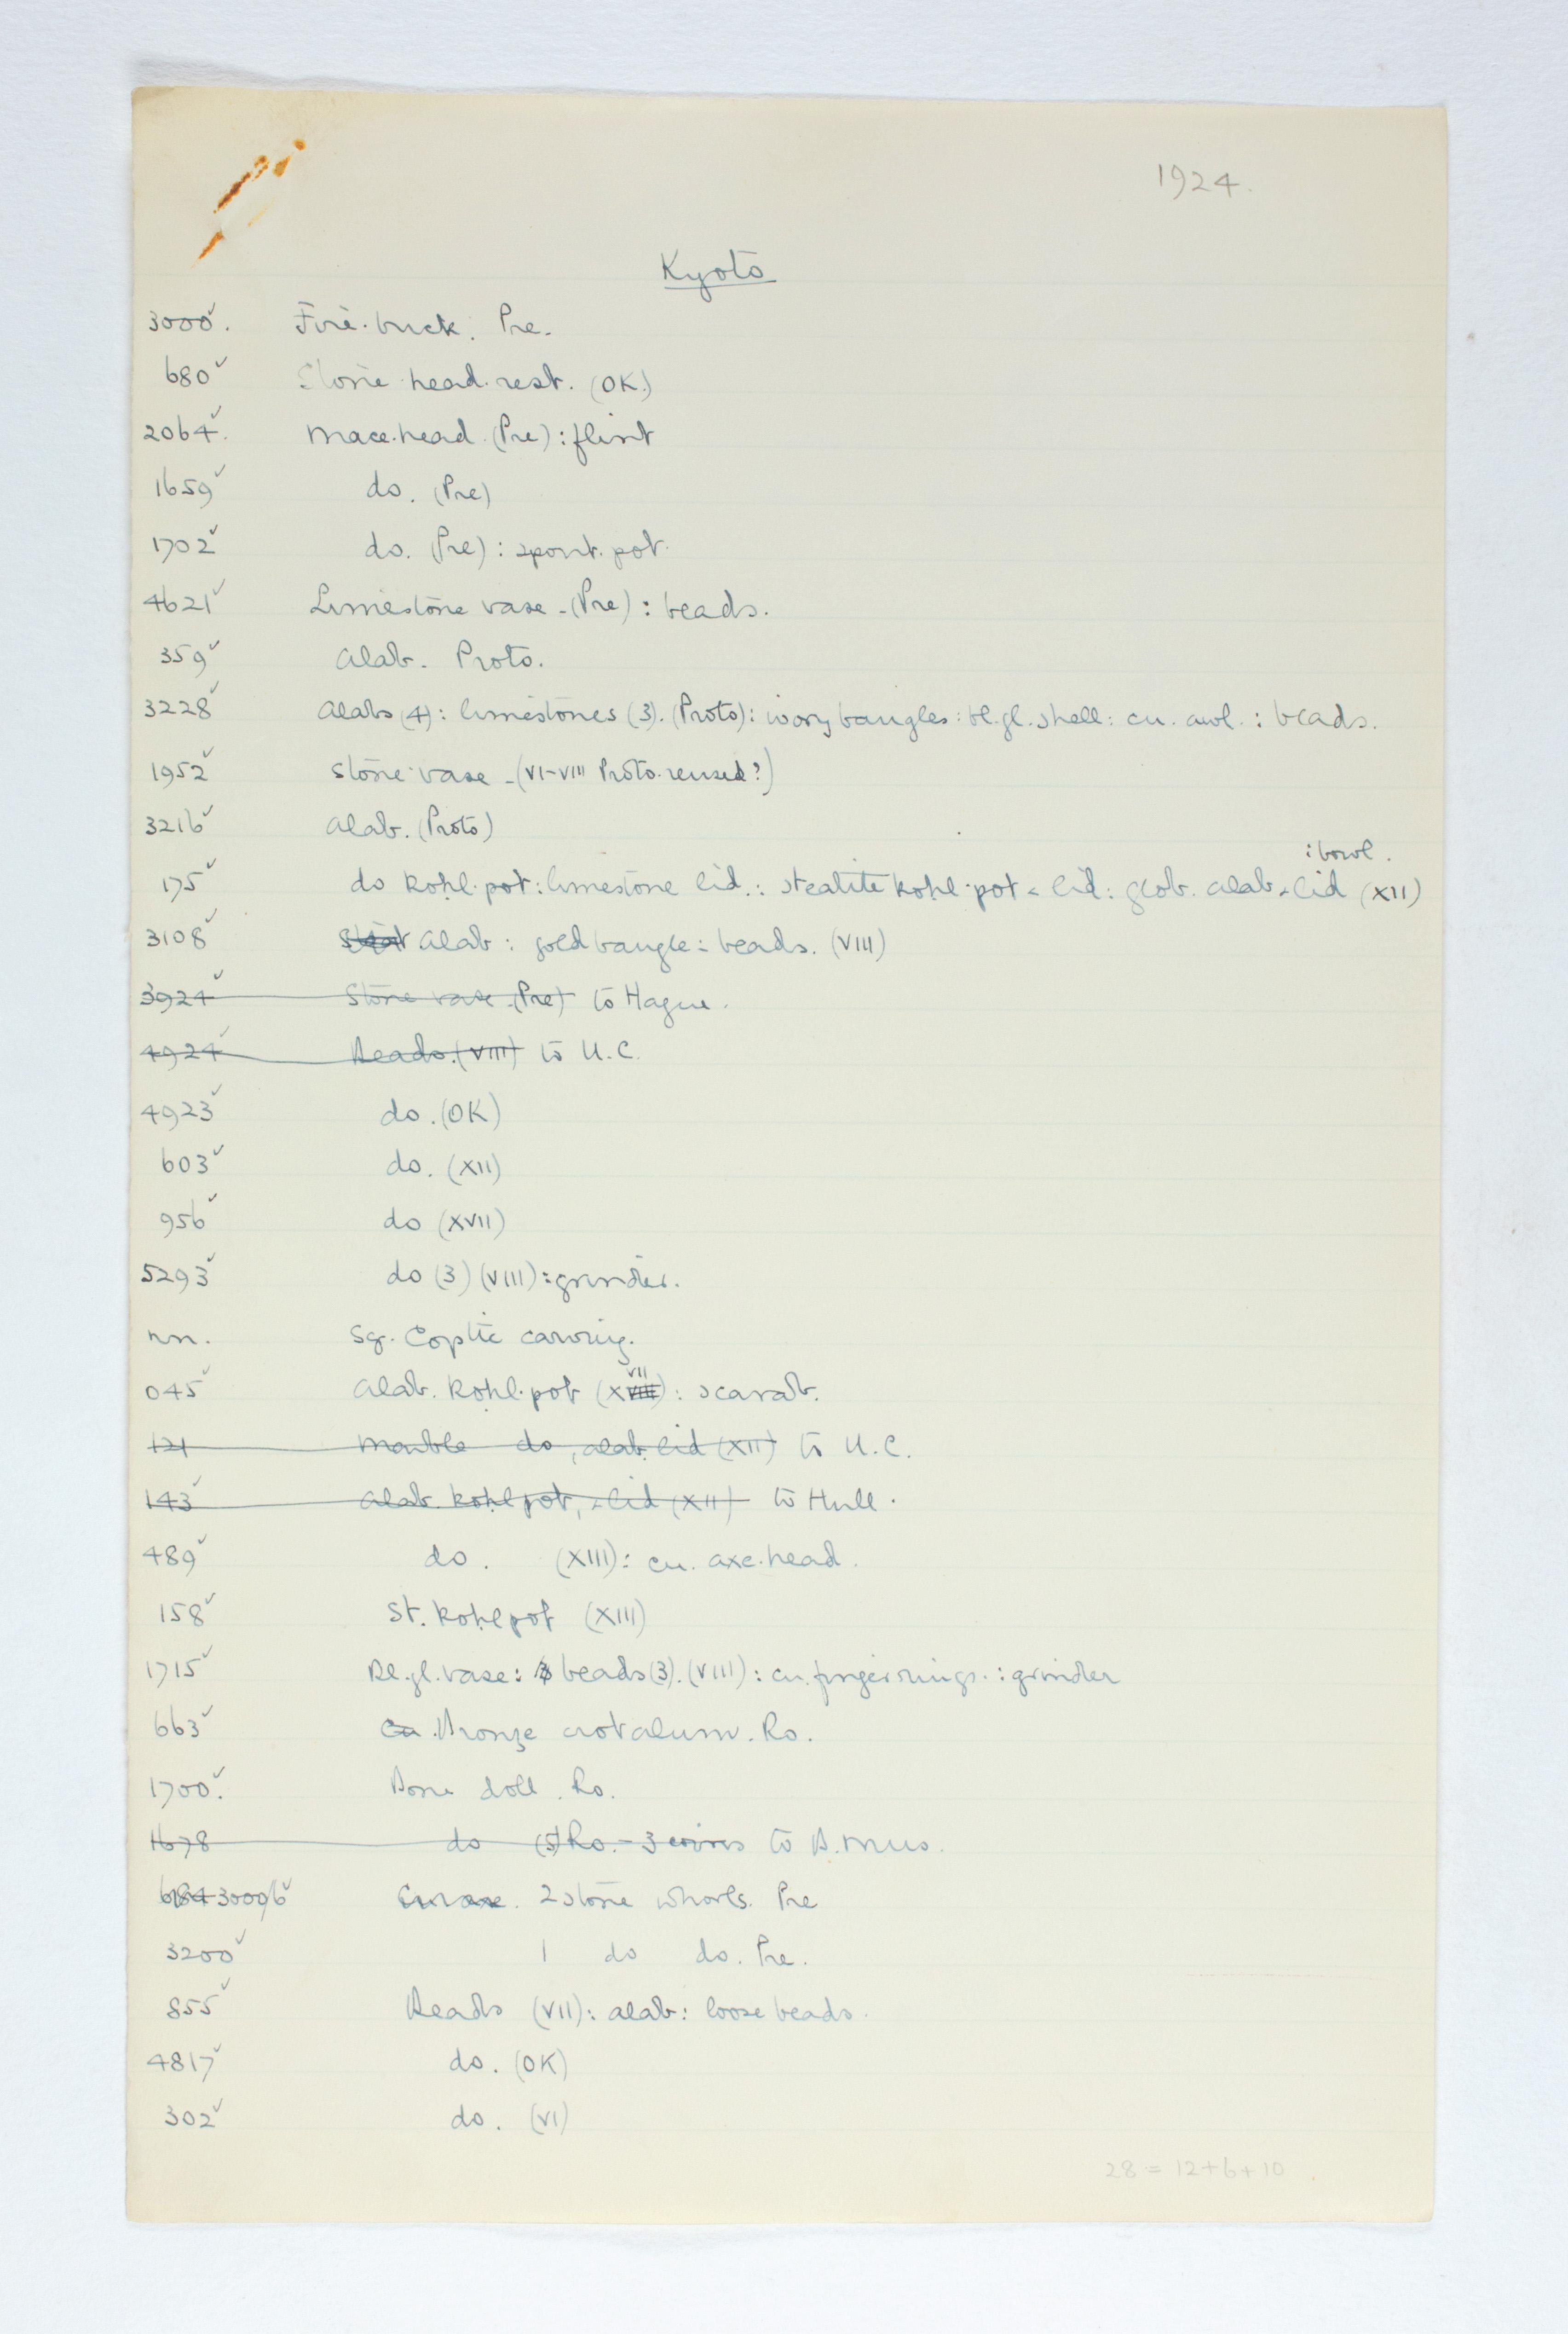 1923-24 Qau el-Kebir, Hemamieh Individual institution list PMA/WFP1/D/27/14.1